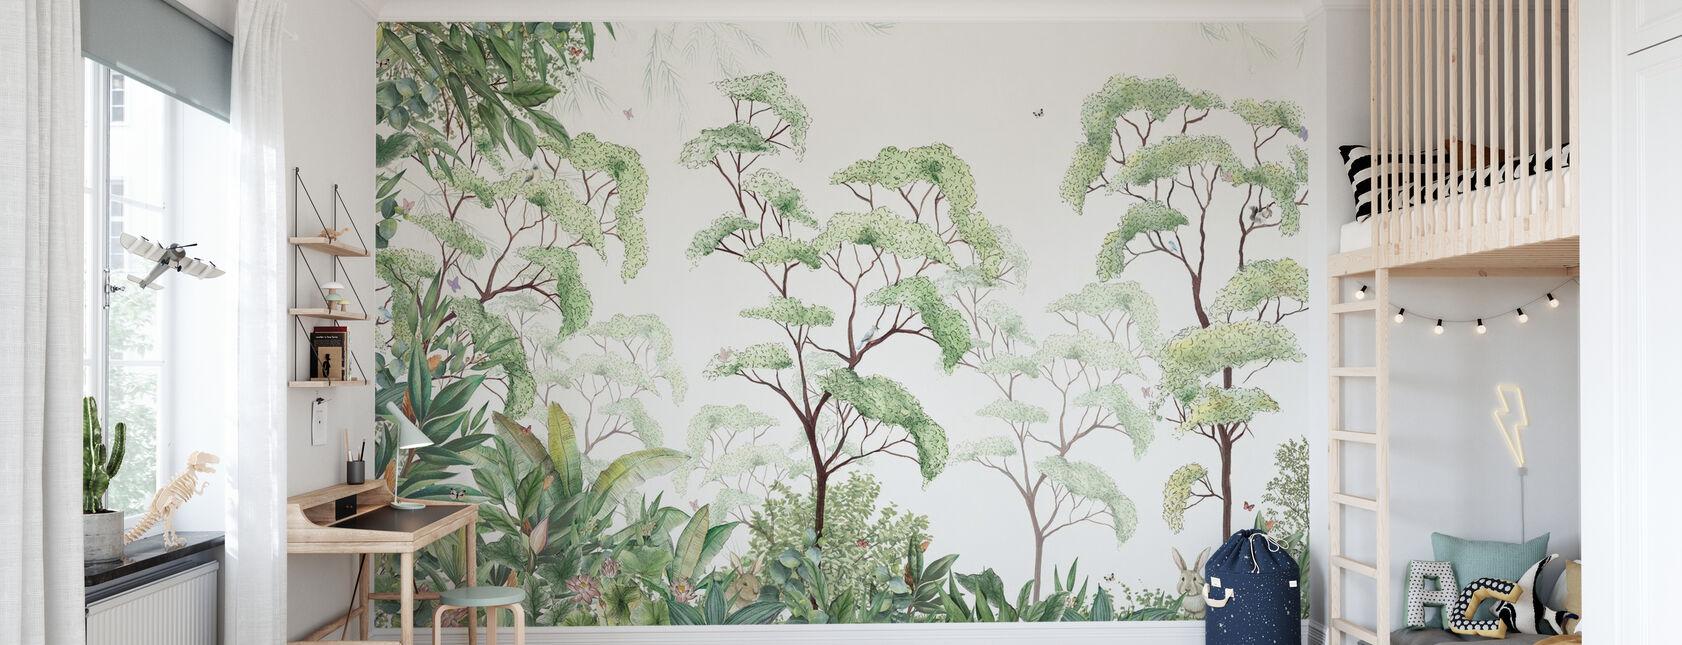 Wald - Tapete - Kinderzimmer